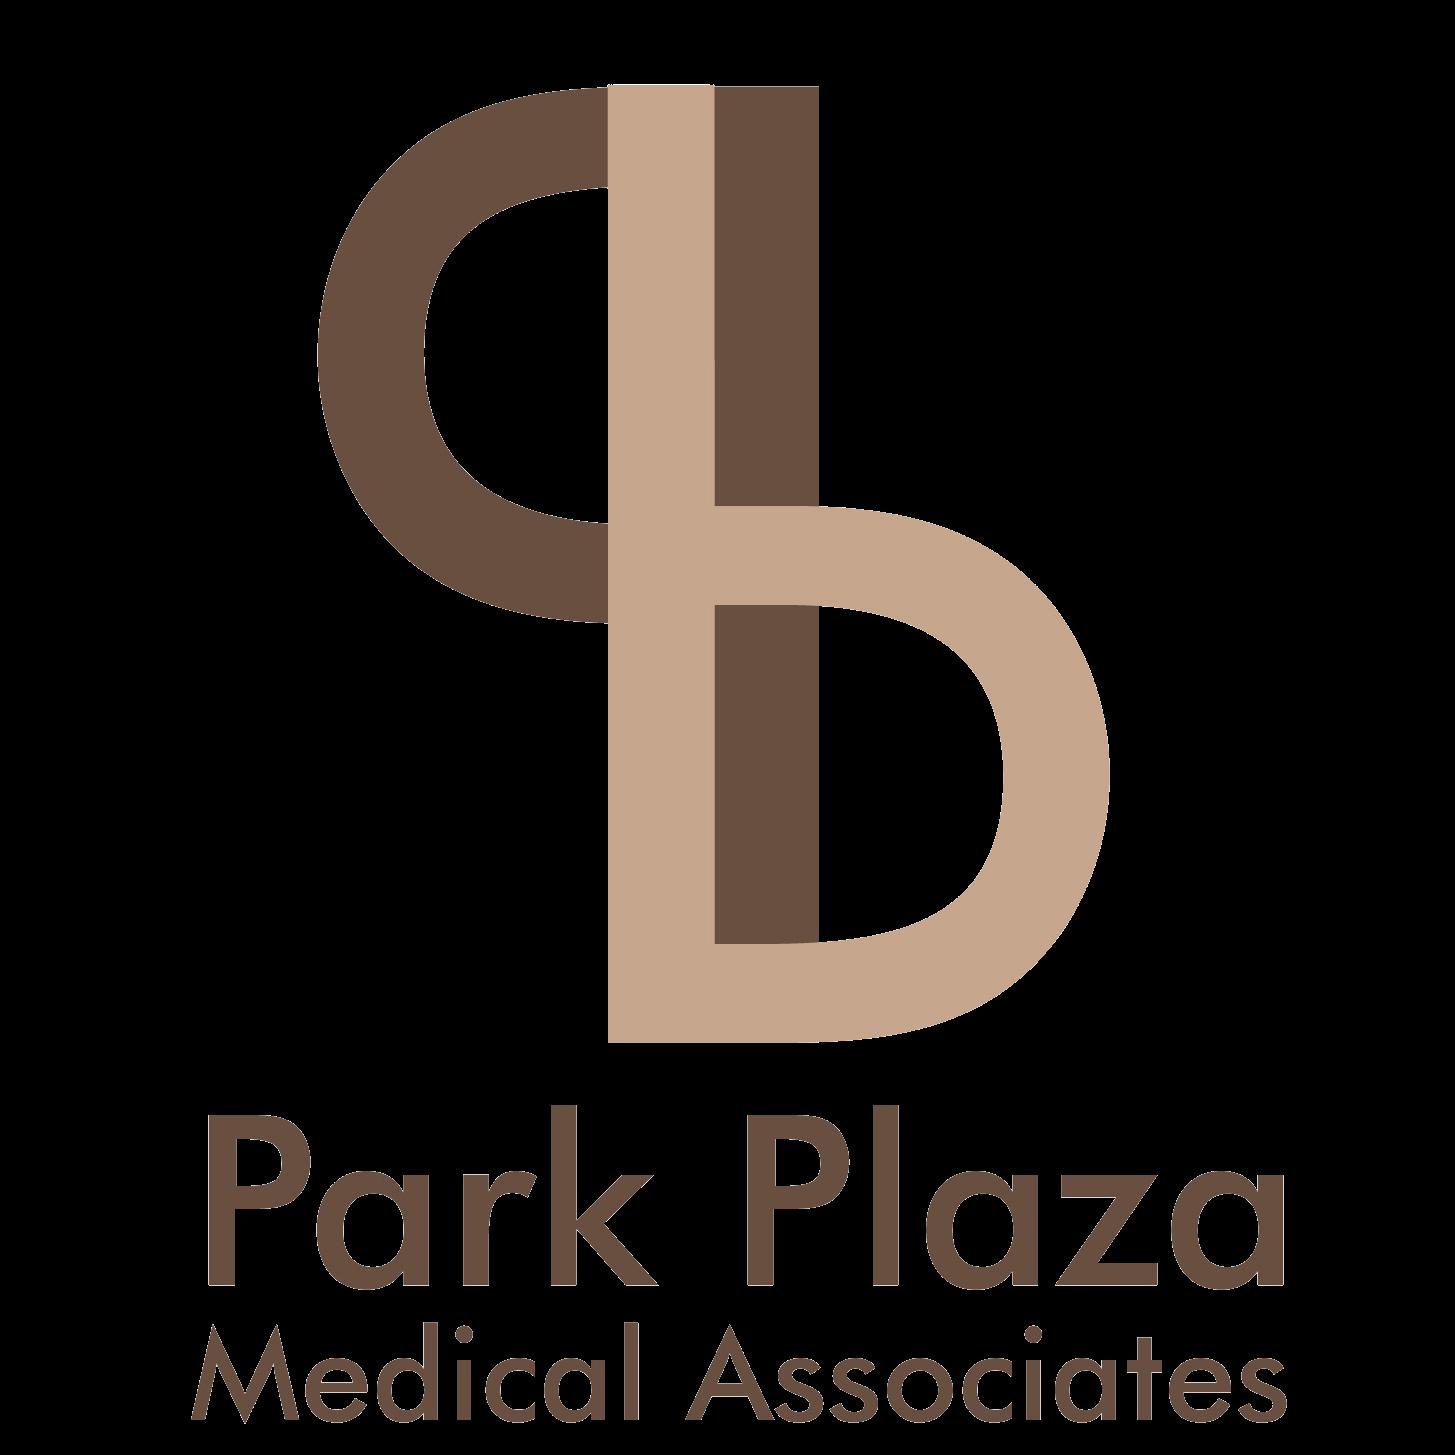 Park Plaza Gastroenterology